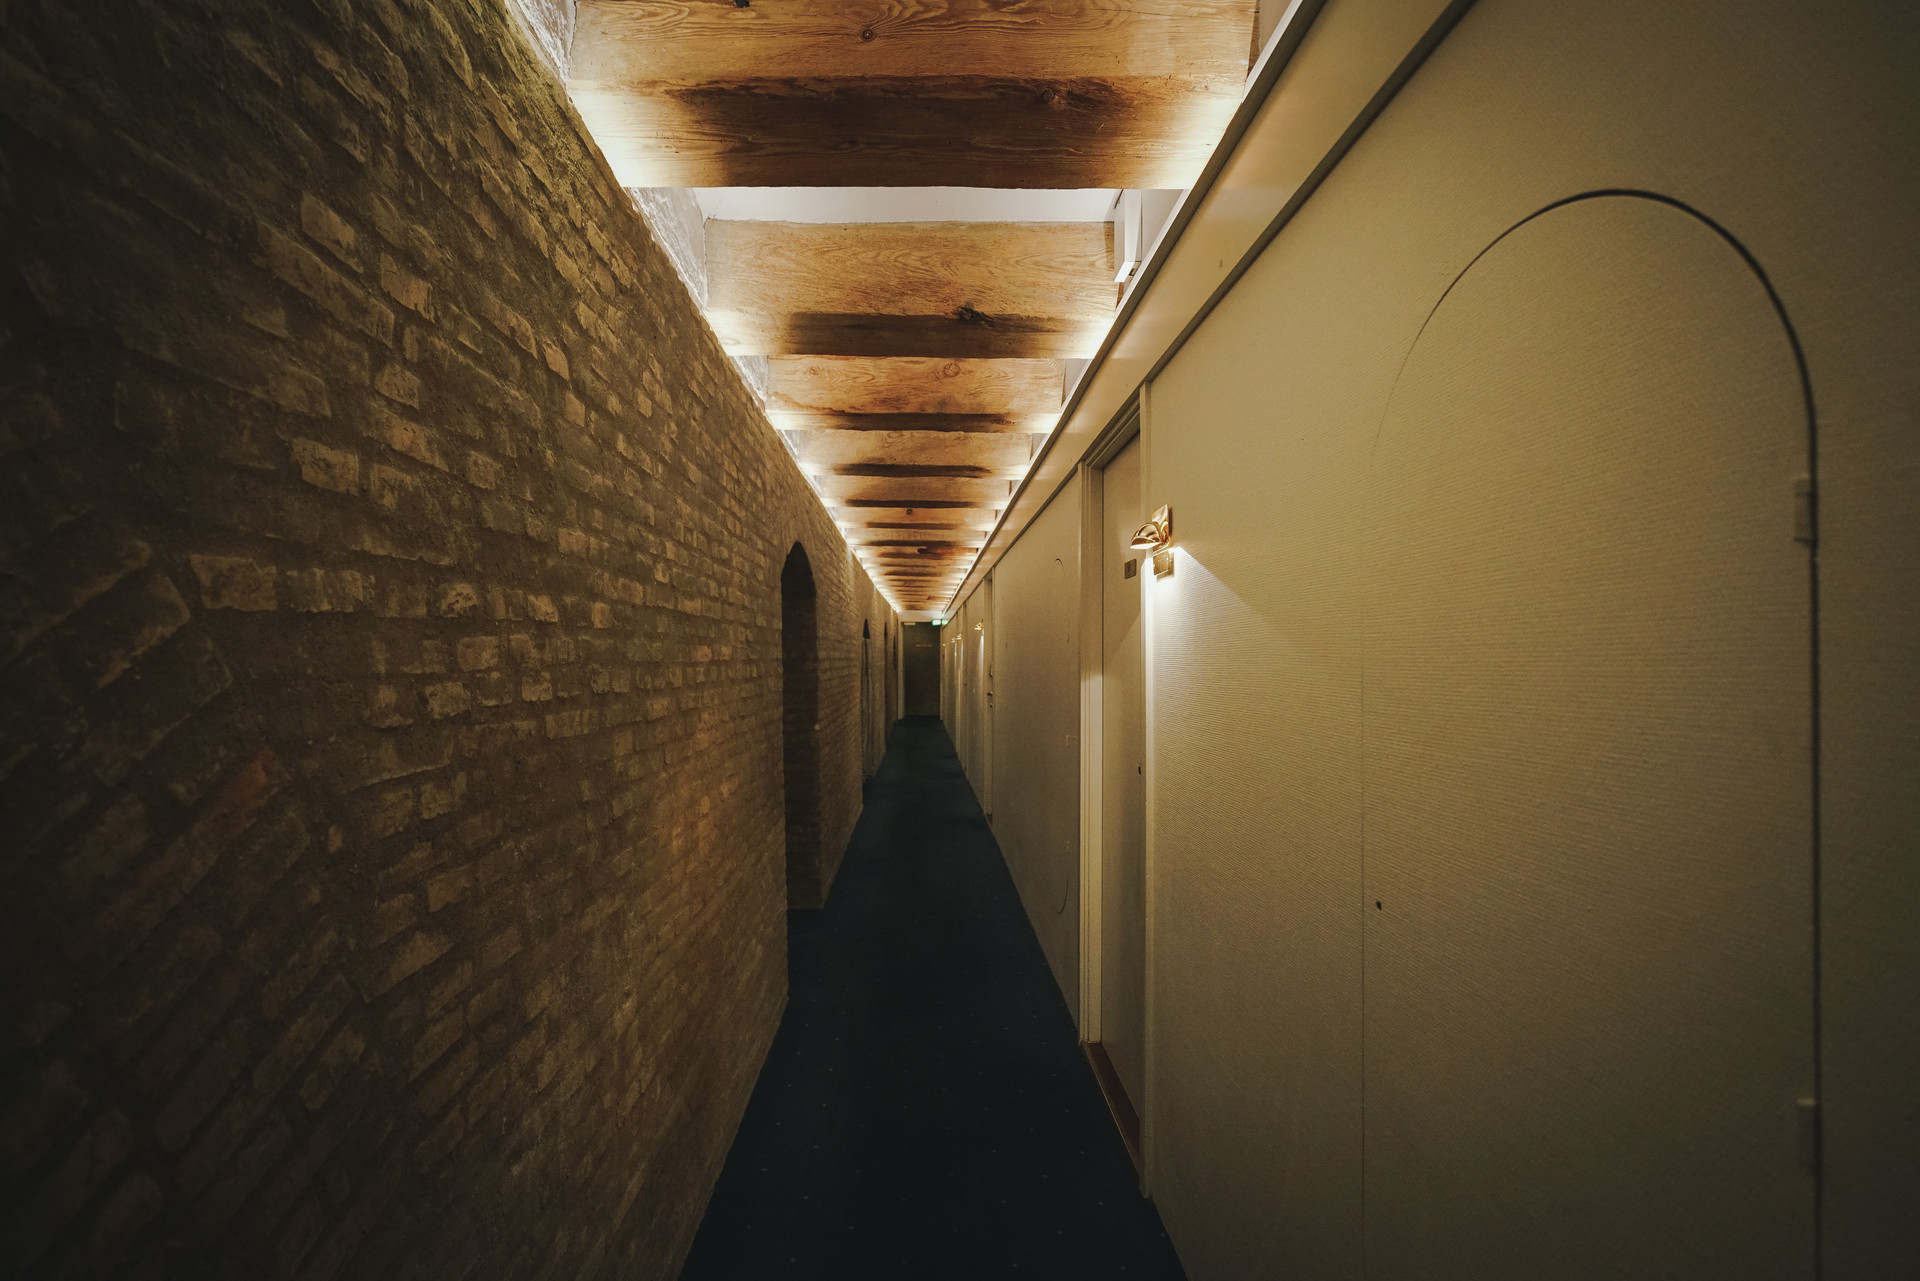 architecture-photo-34.jpg